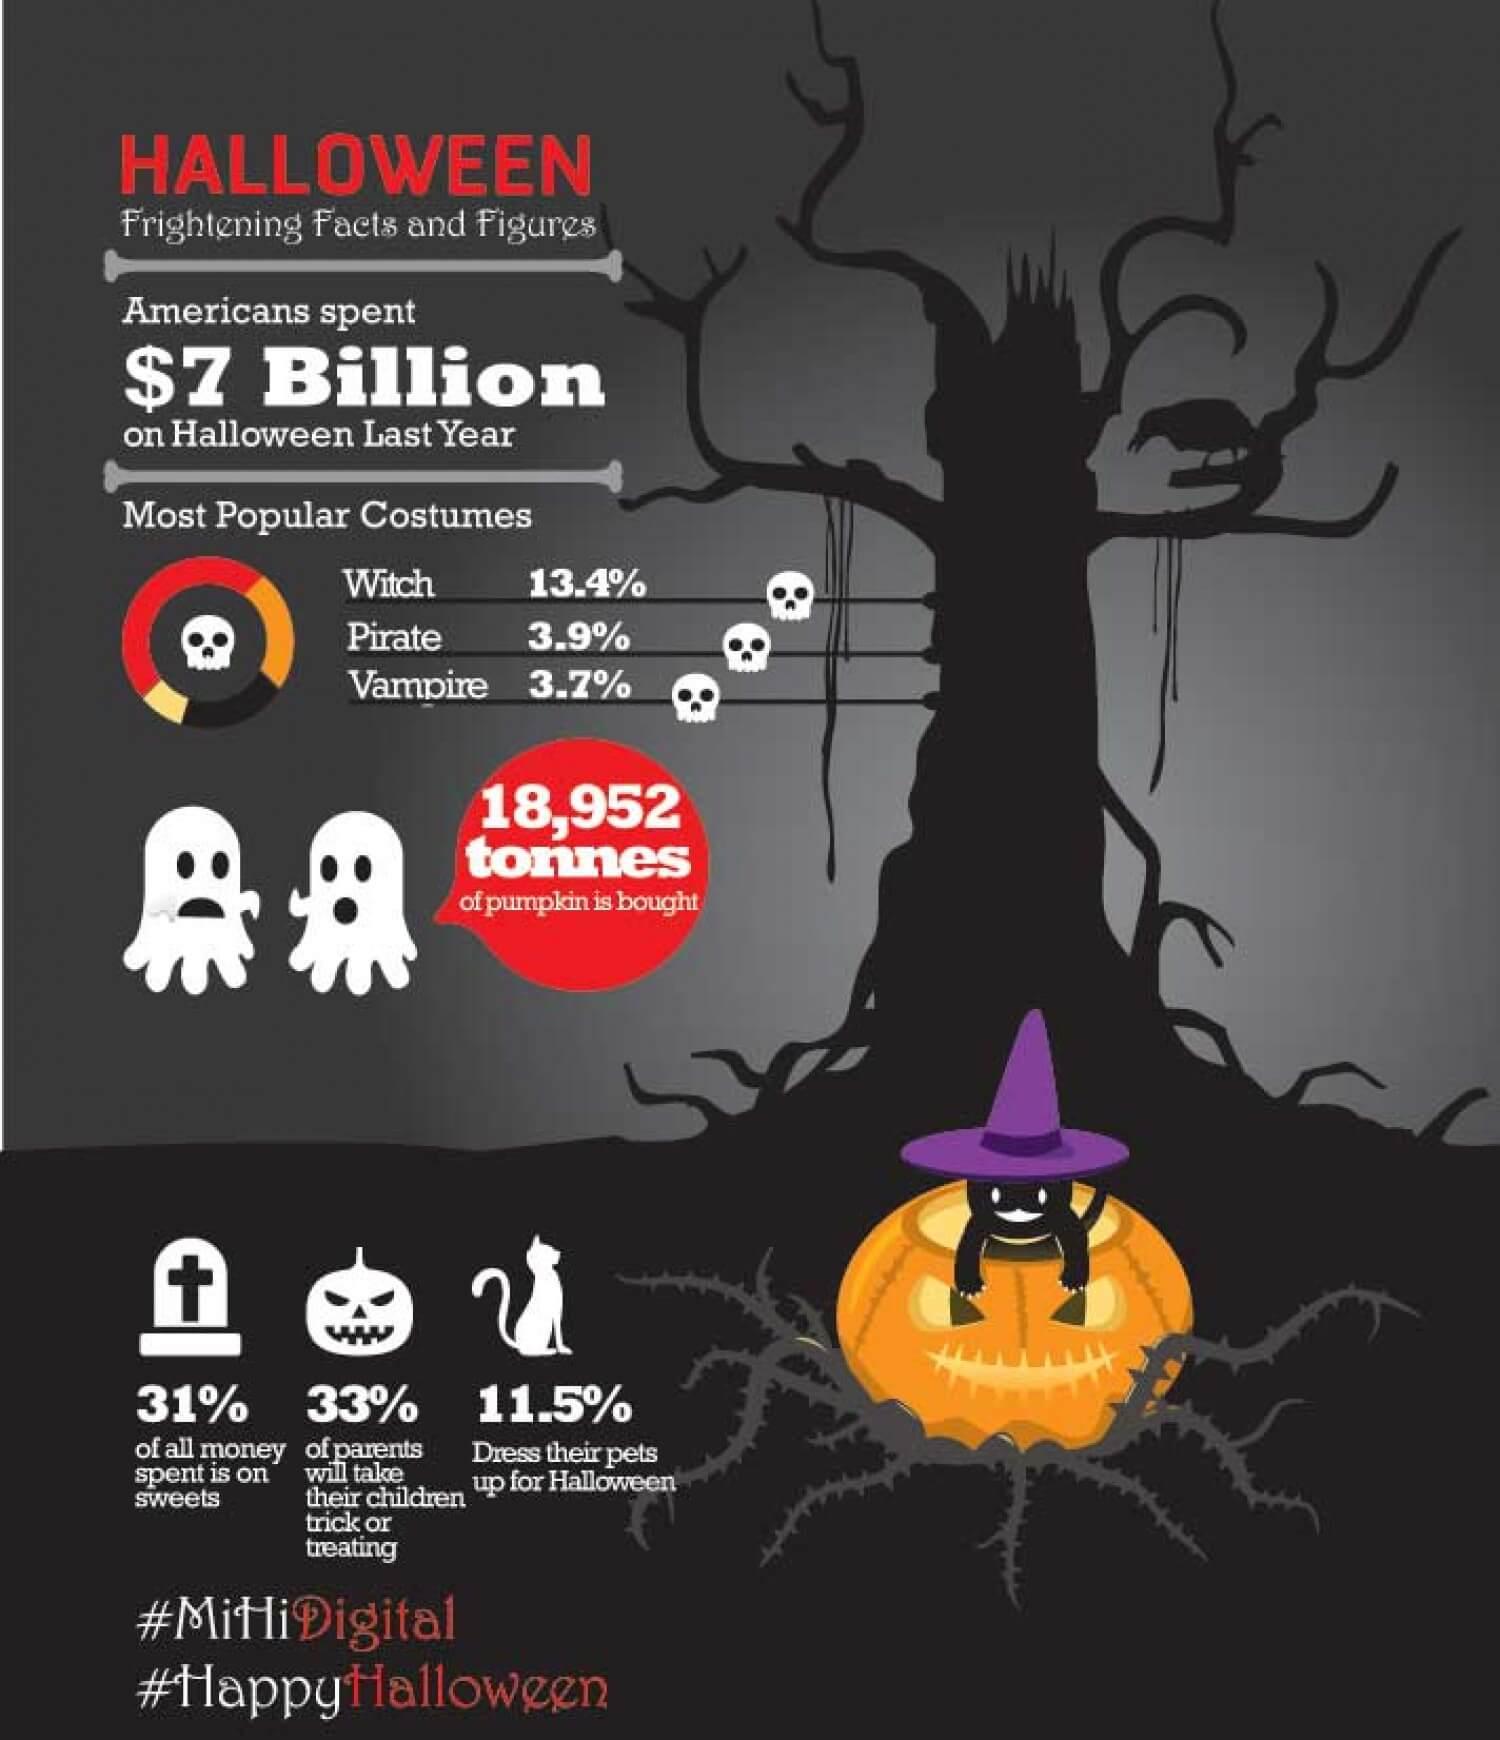 Halloween Facts infographic spending